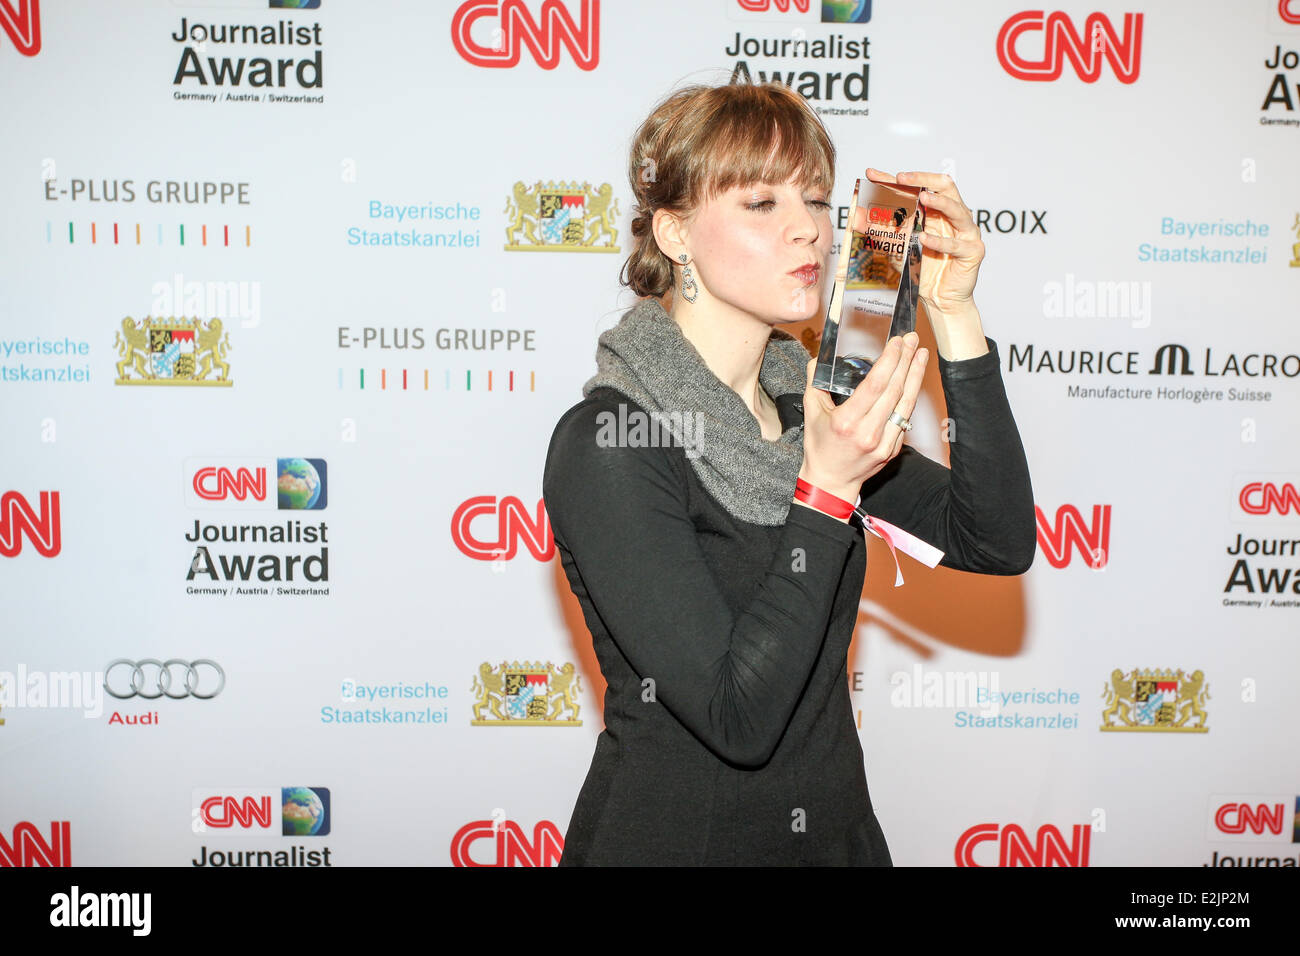 Sabine Rossi at the CNN Journalist Award at Kuenstlerhaus am Lenbachplatz square.  Where: Munich, Germany When: - Stock Image